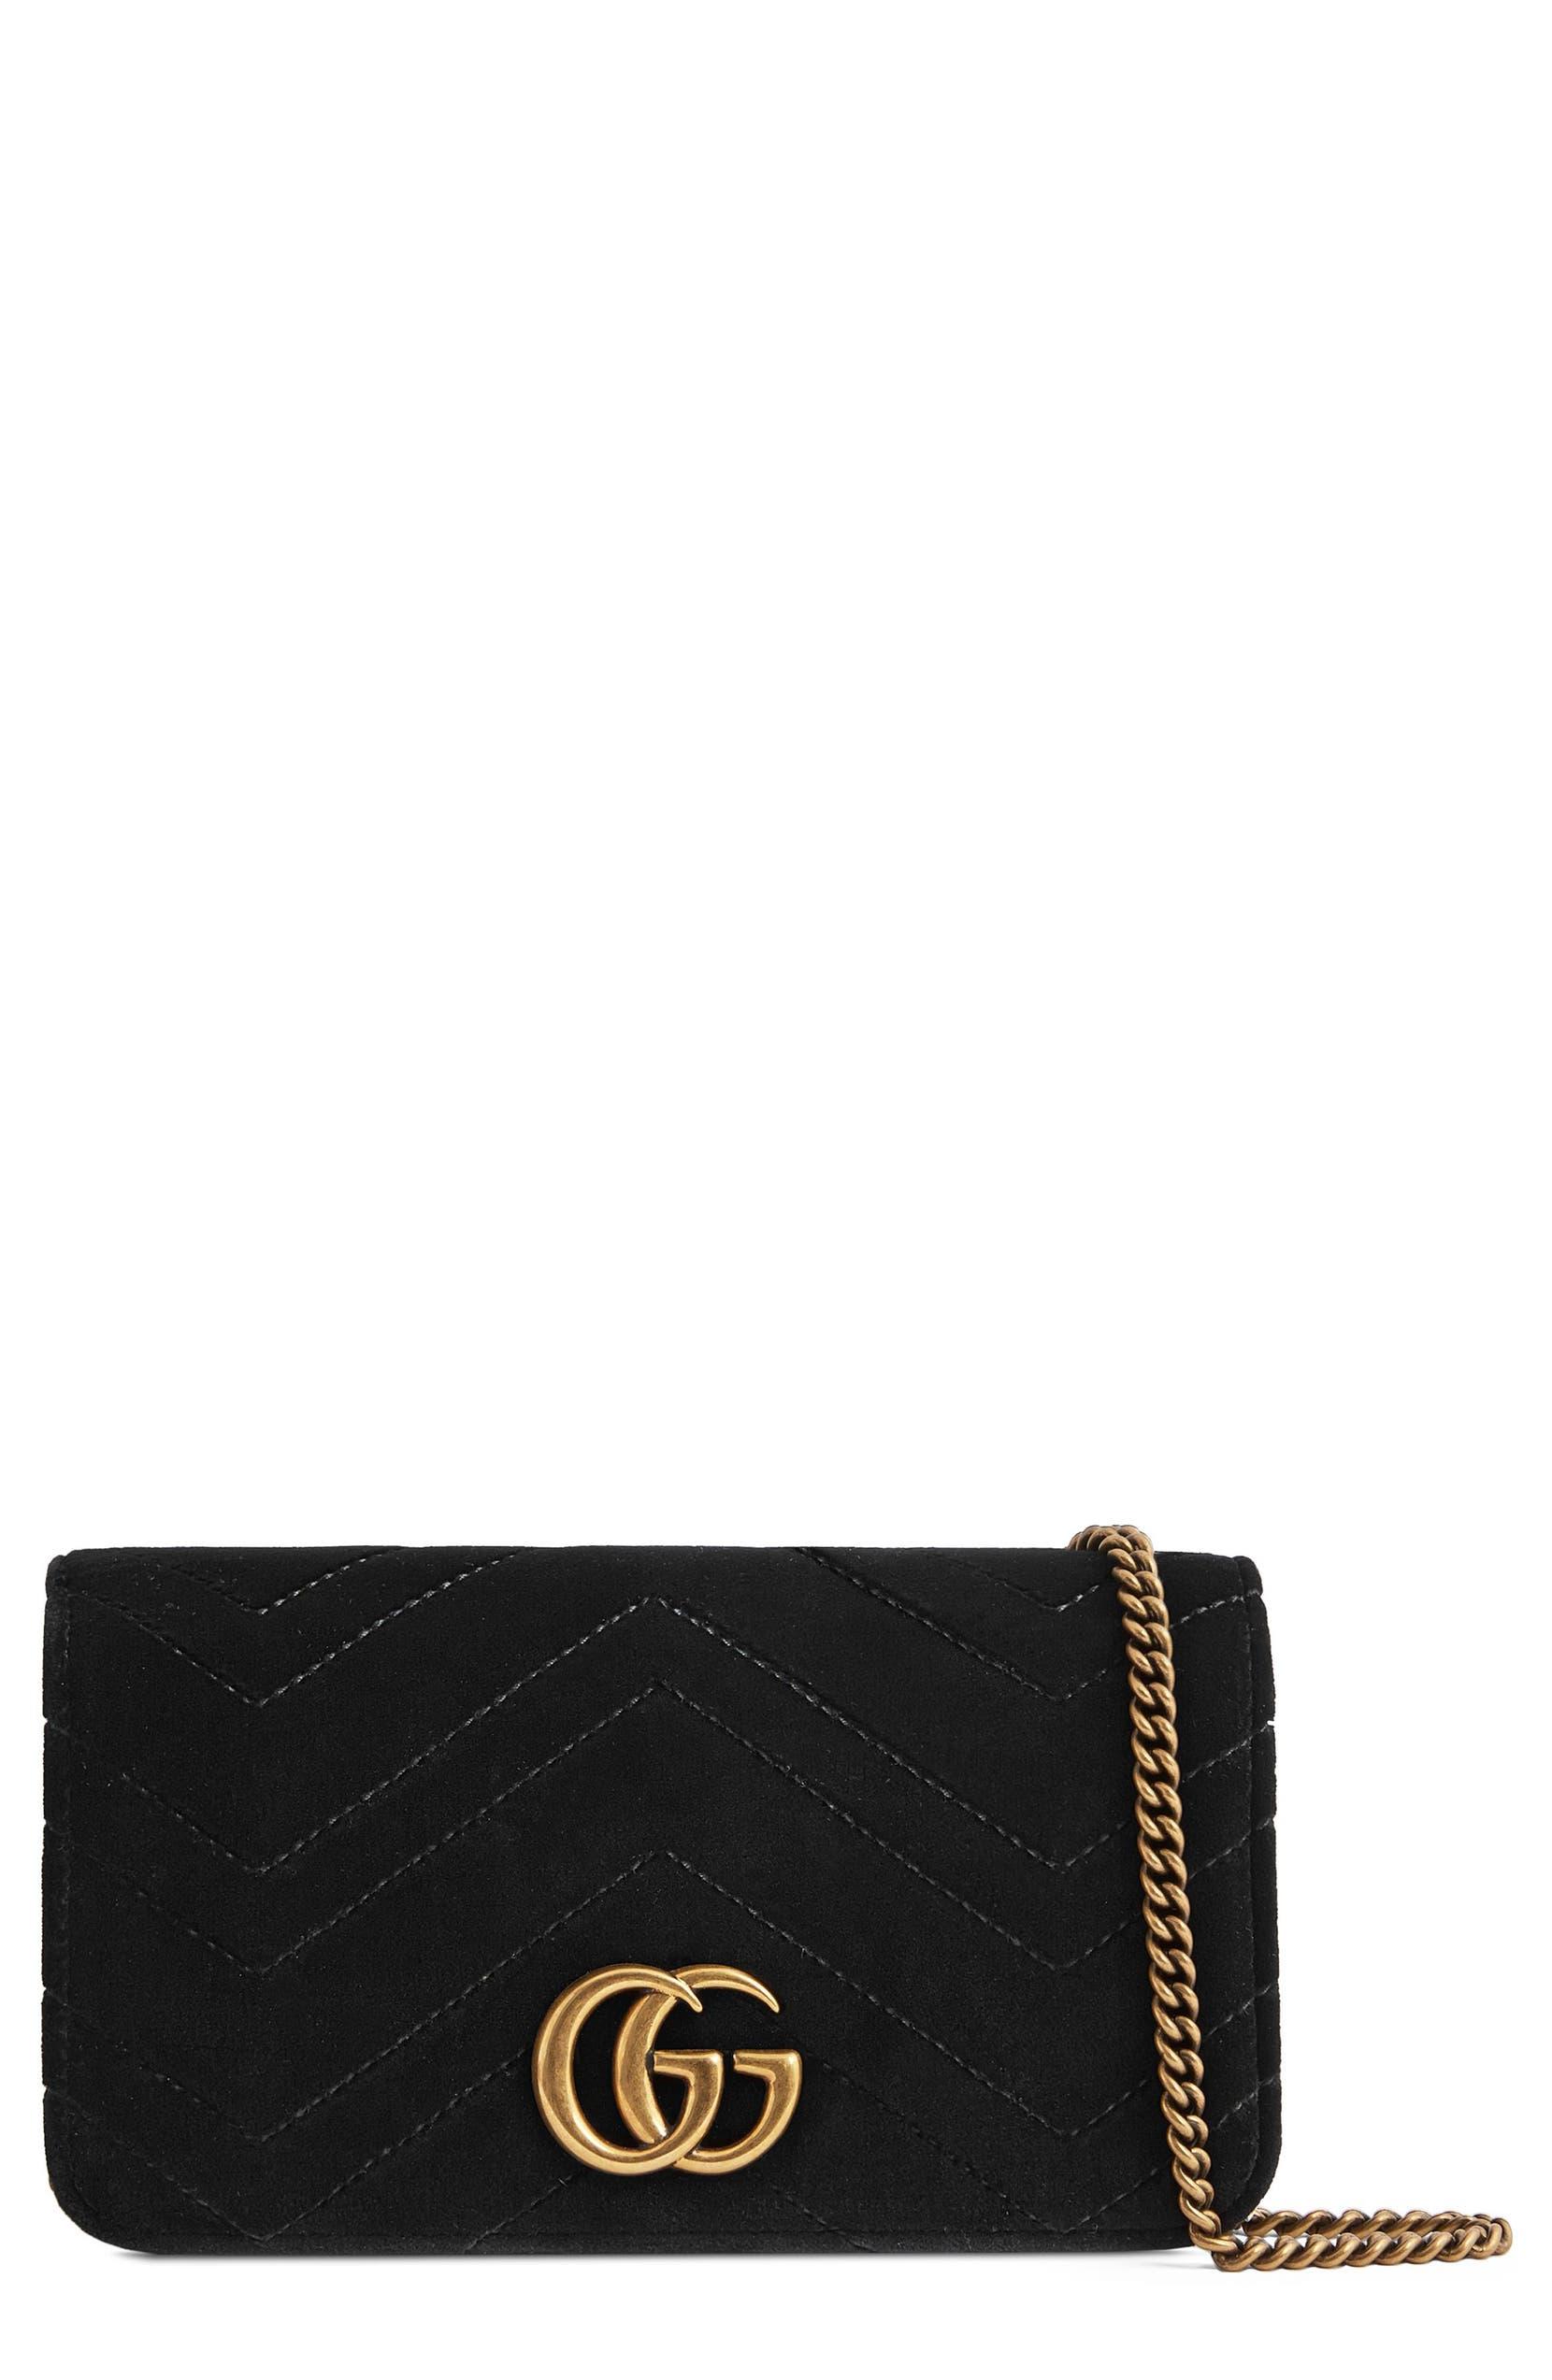 6e9f387ae Gucci GG Marmont 2.0 Matelassé Velvet Shoulder Bag   Nordstrom